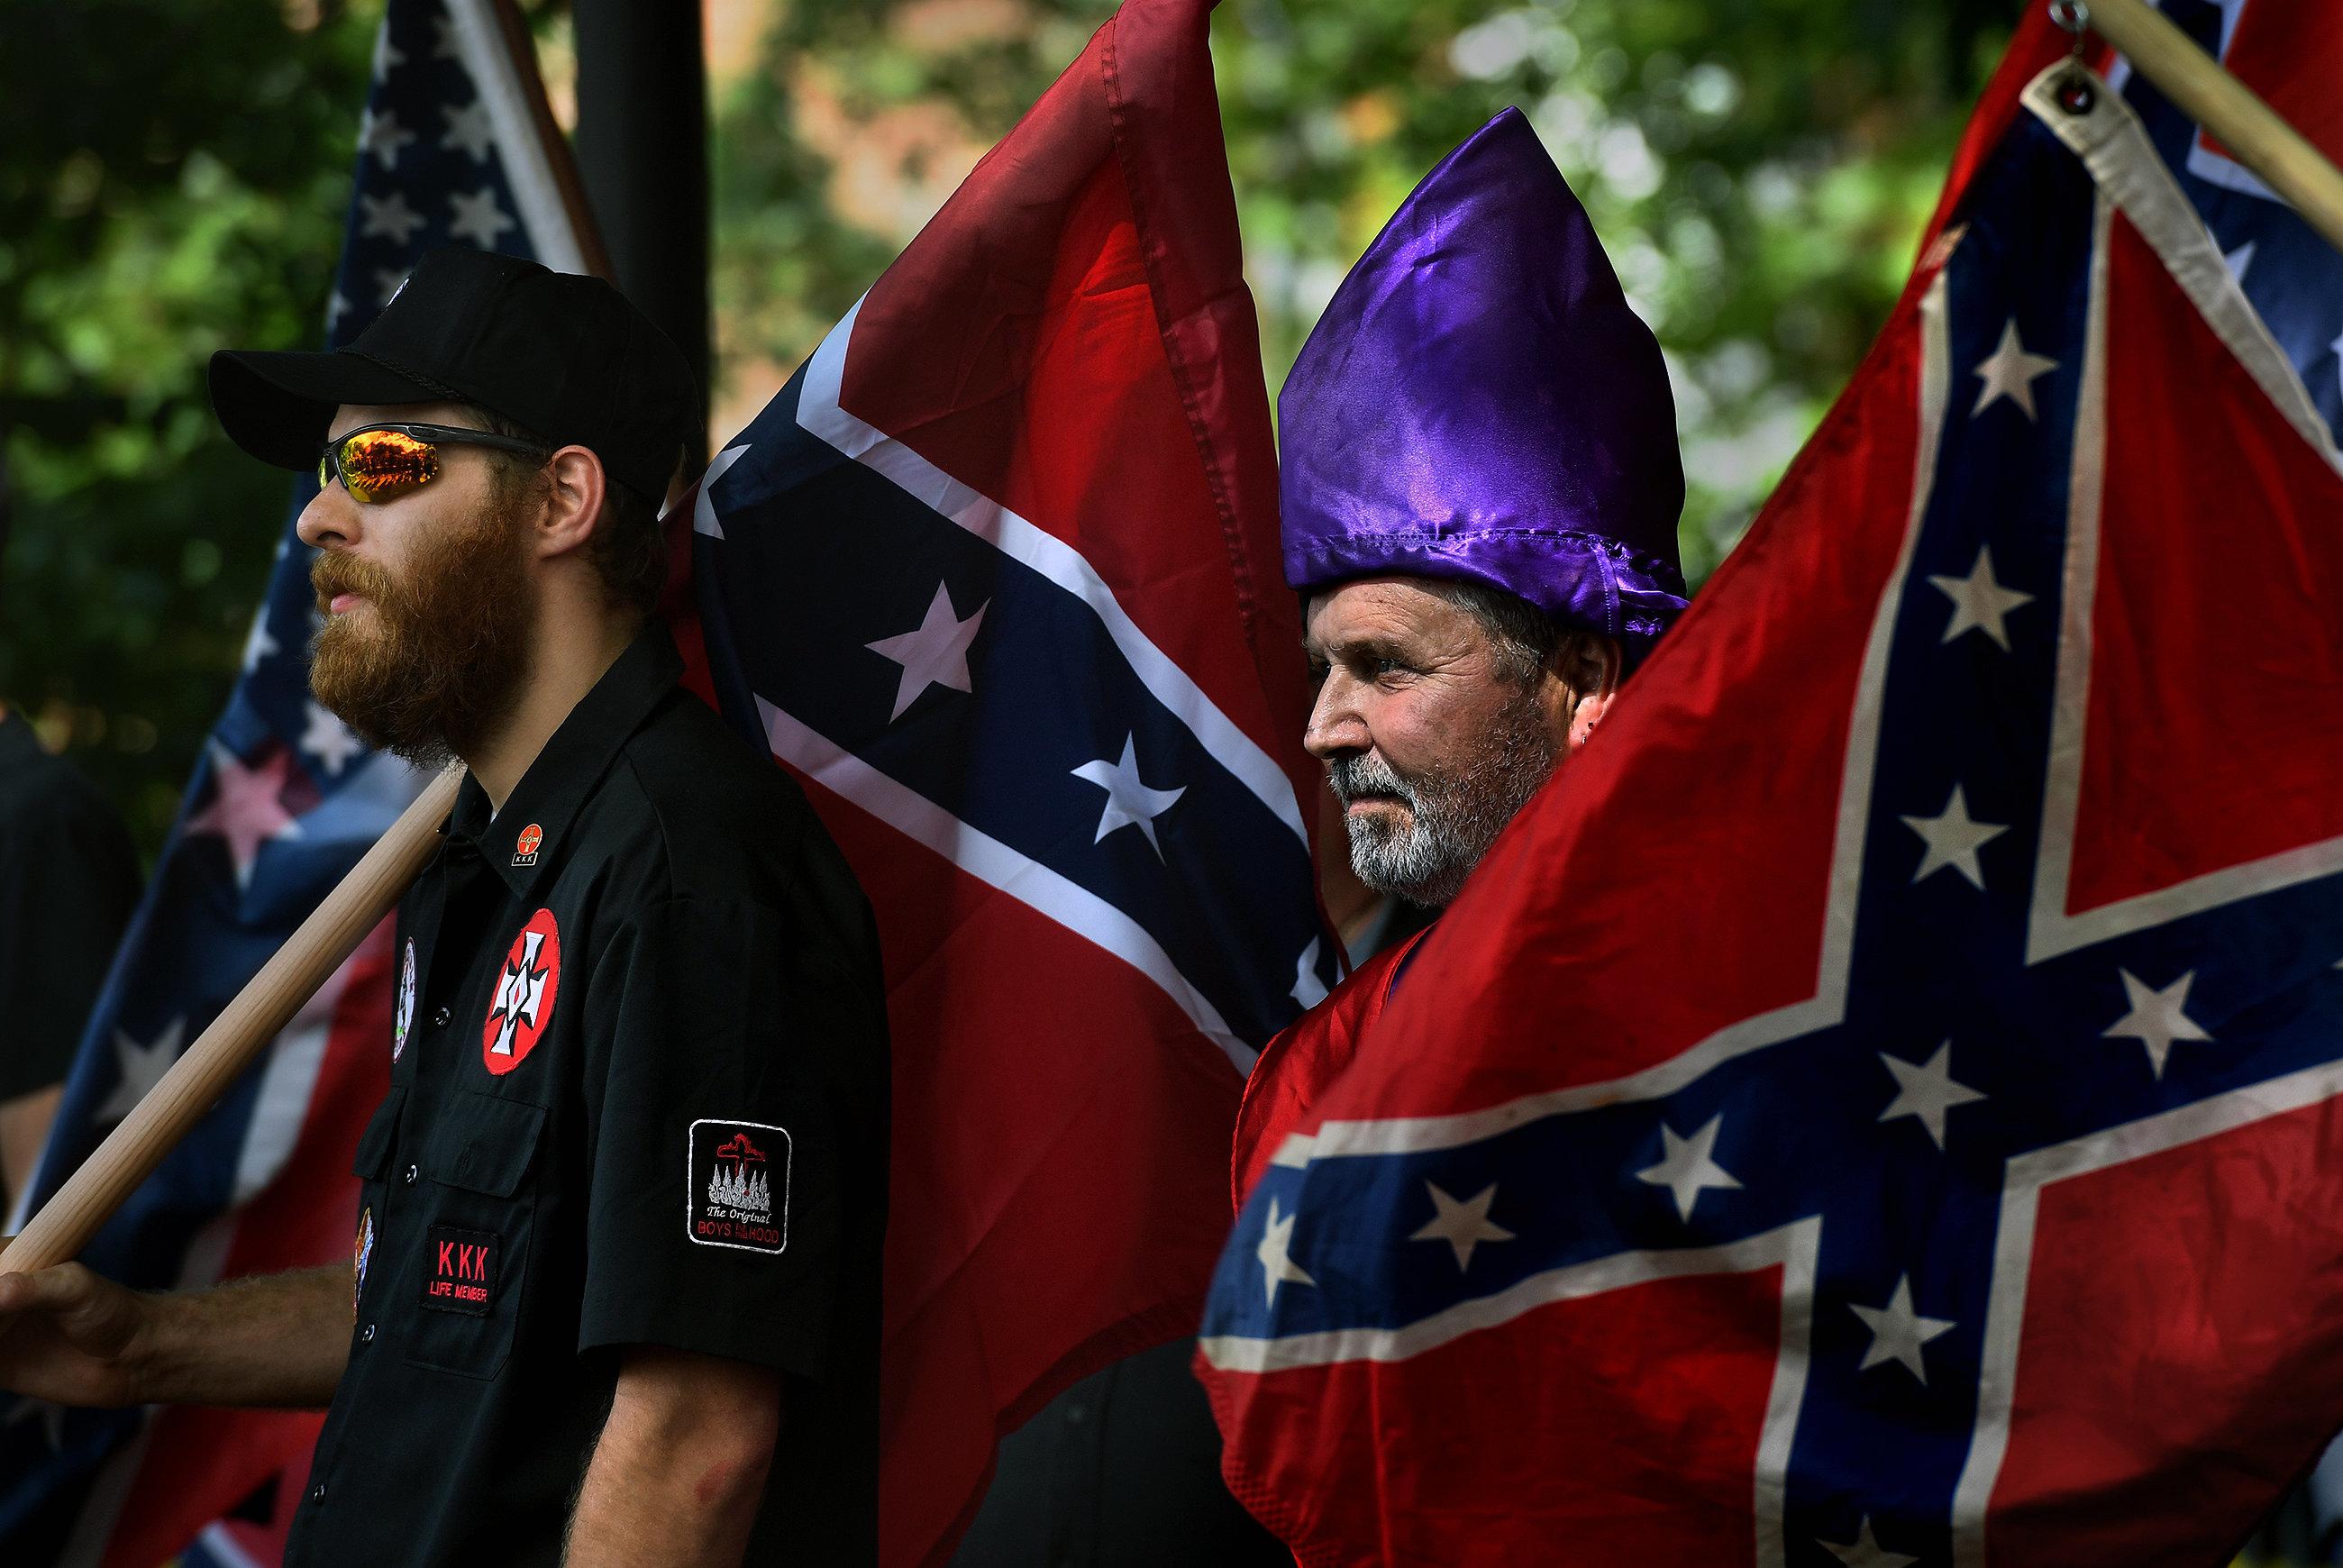 Neo-Nazis Praise Trump's Charlottesville Reaction: 'He Loves Us